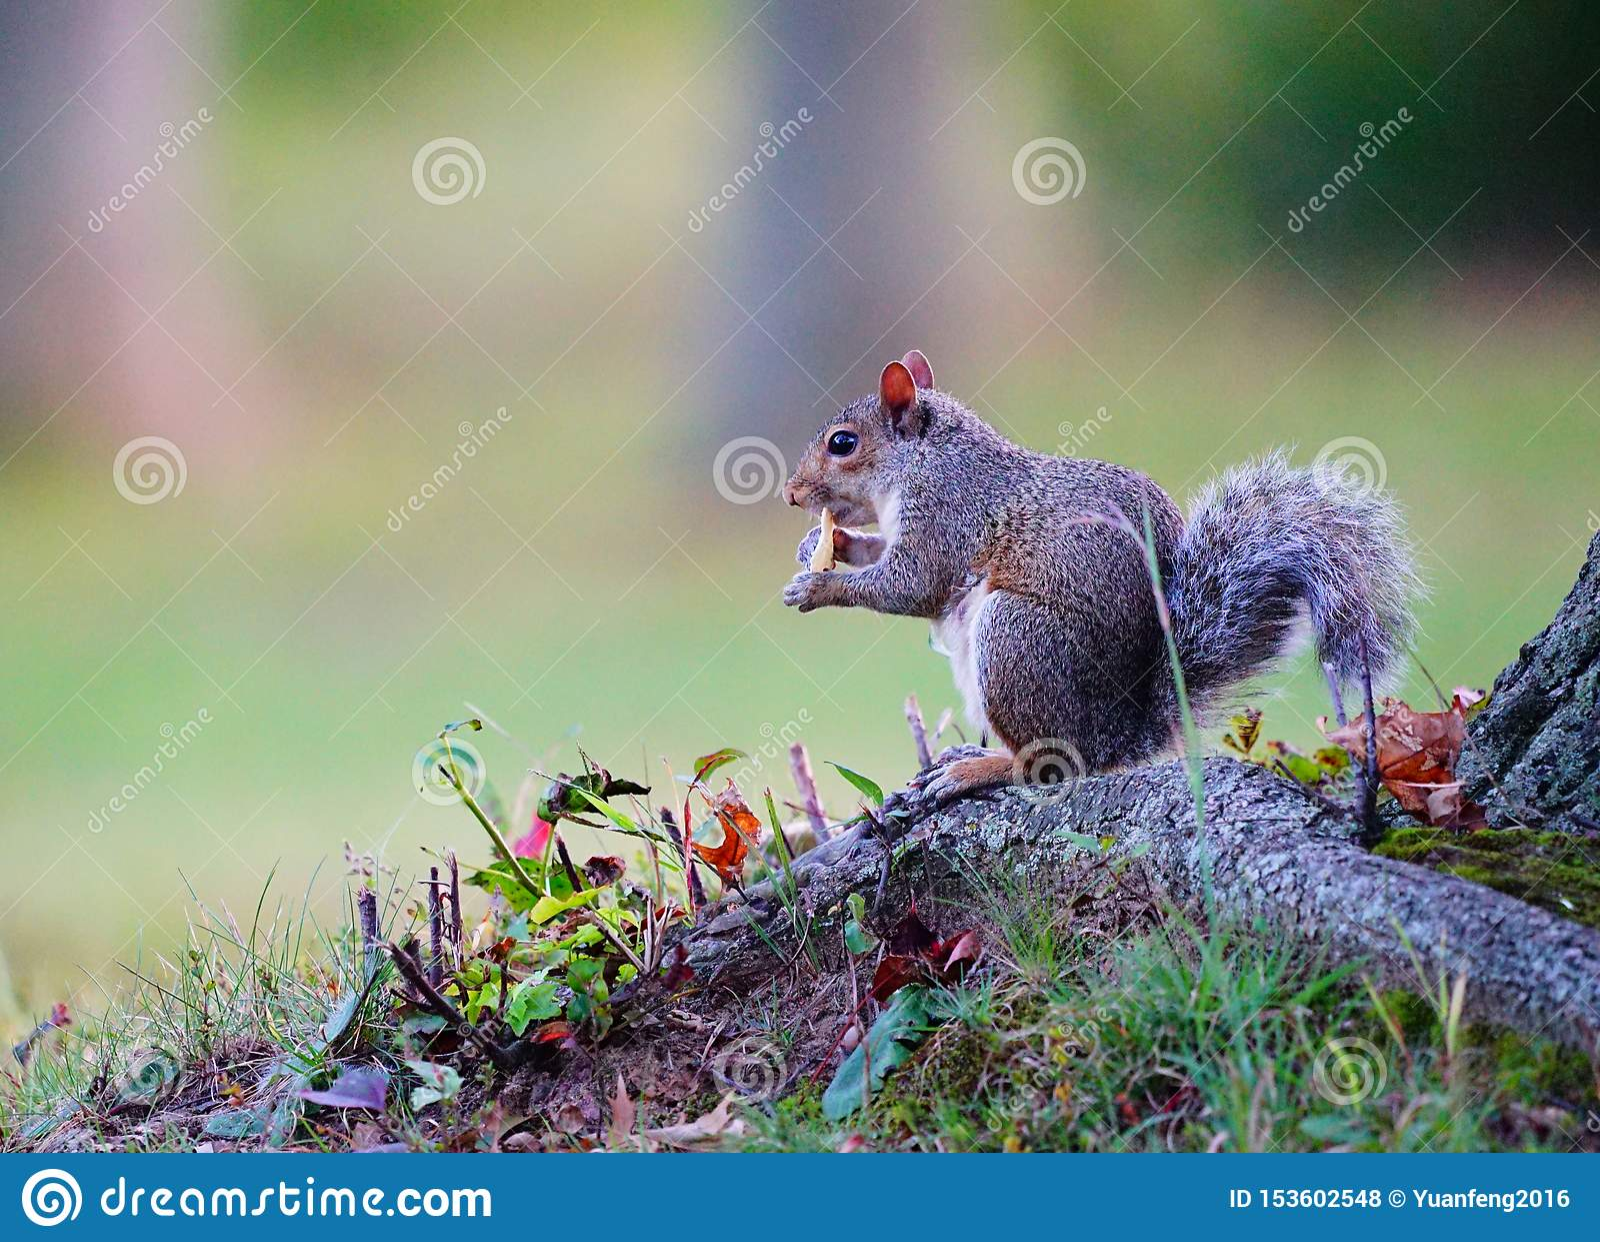 Squirrel having snack